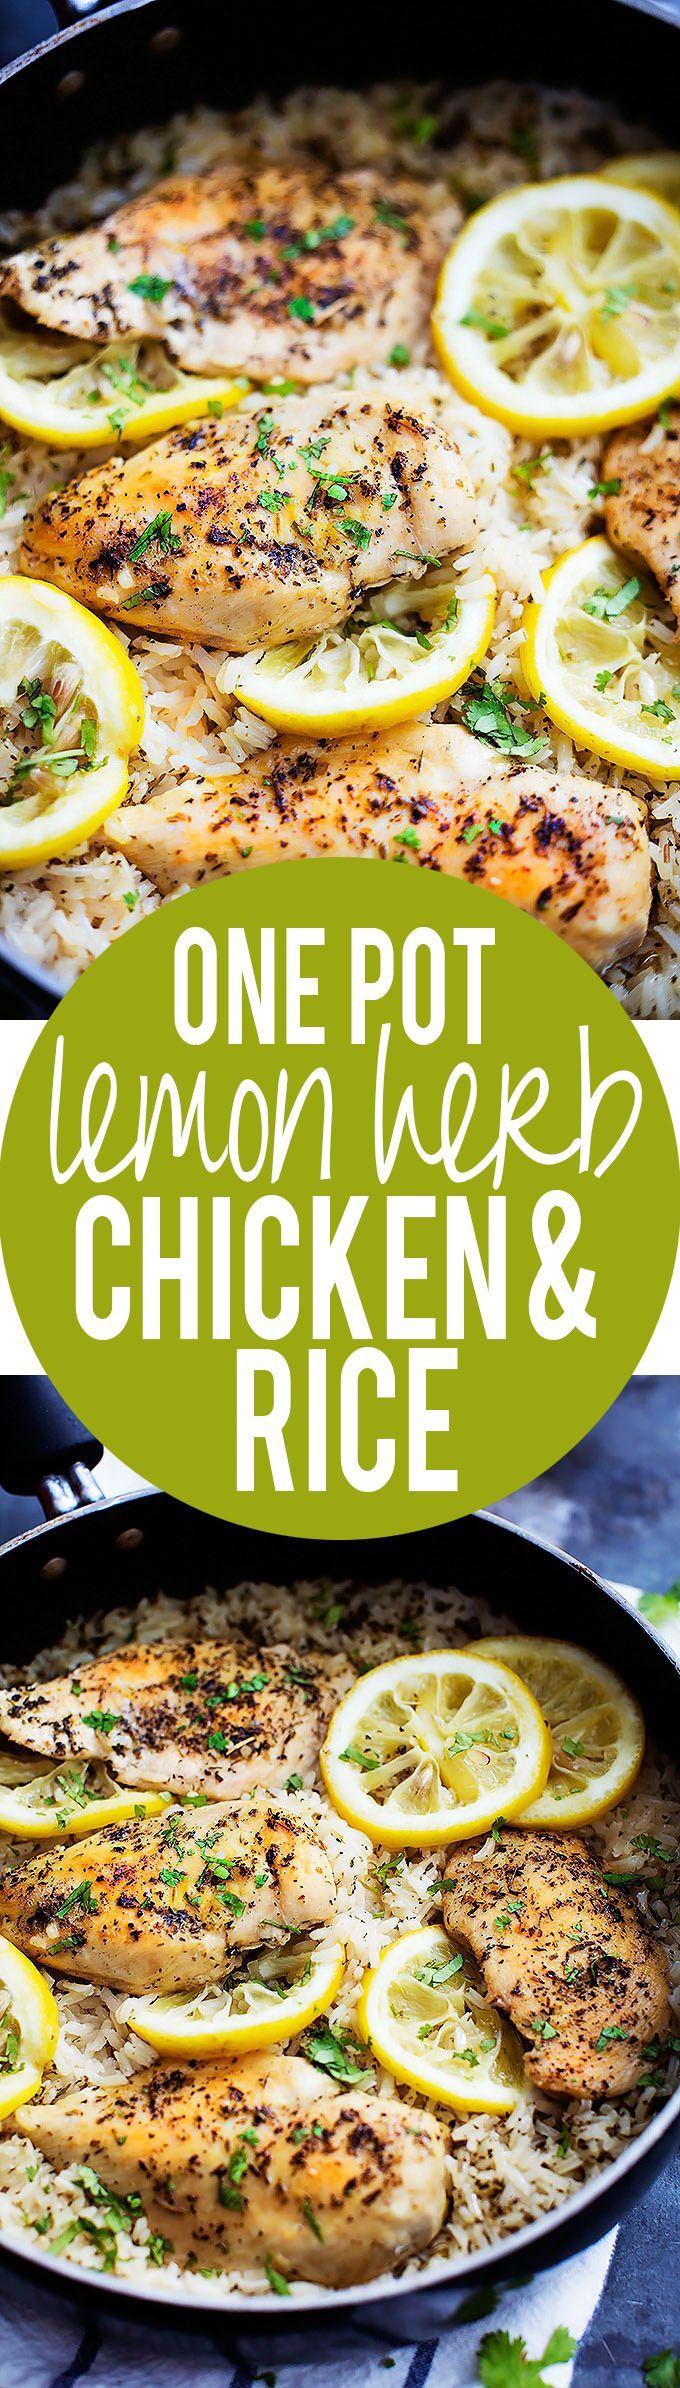 One Pot Lemon Herb Chicken & Rice #healthy #chicken #recipes